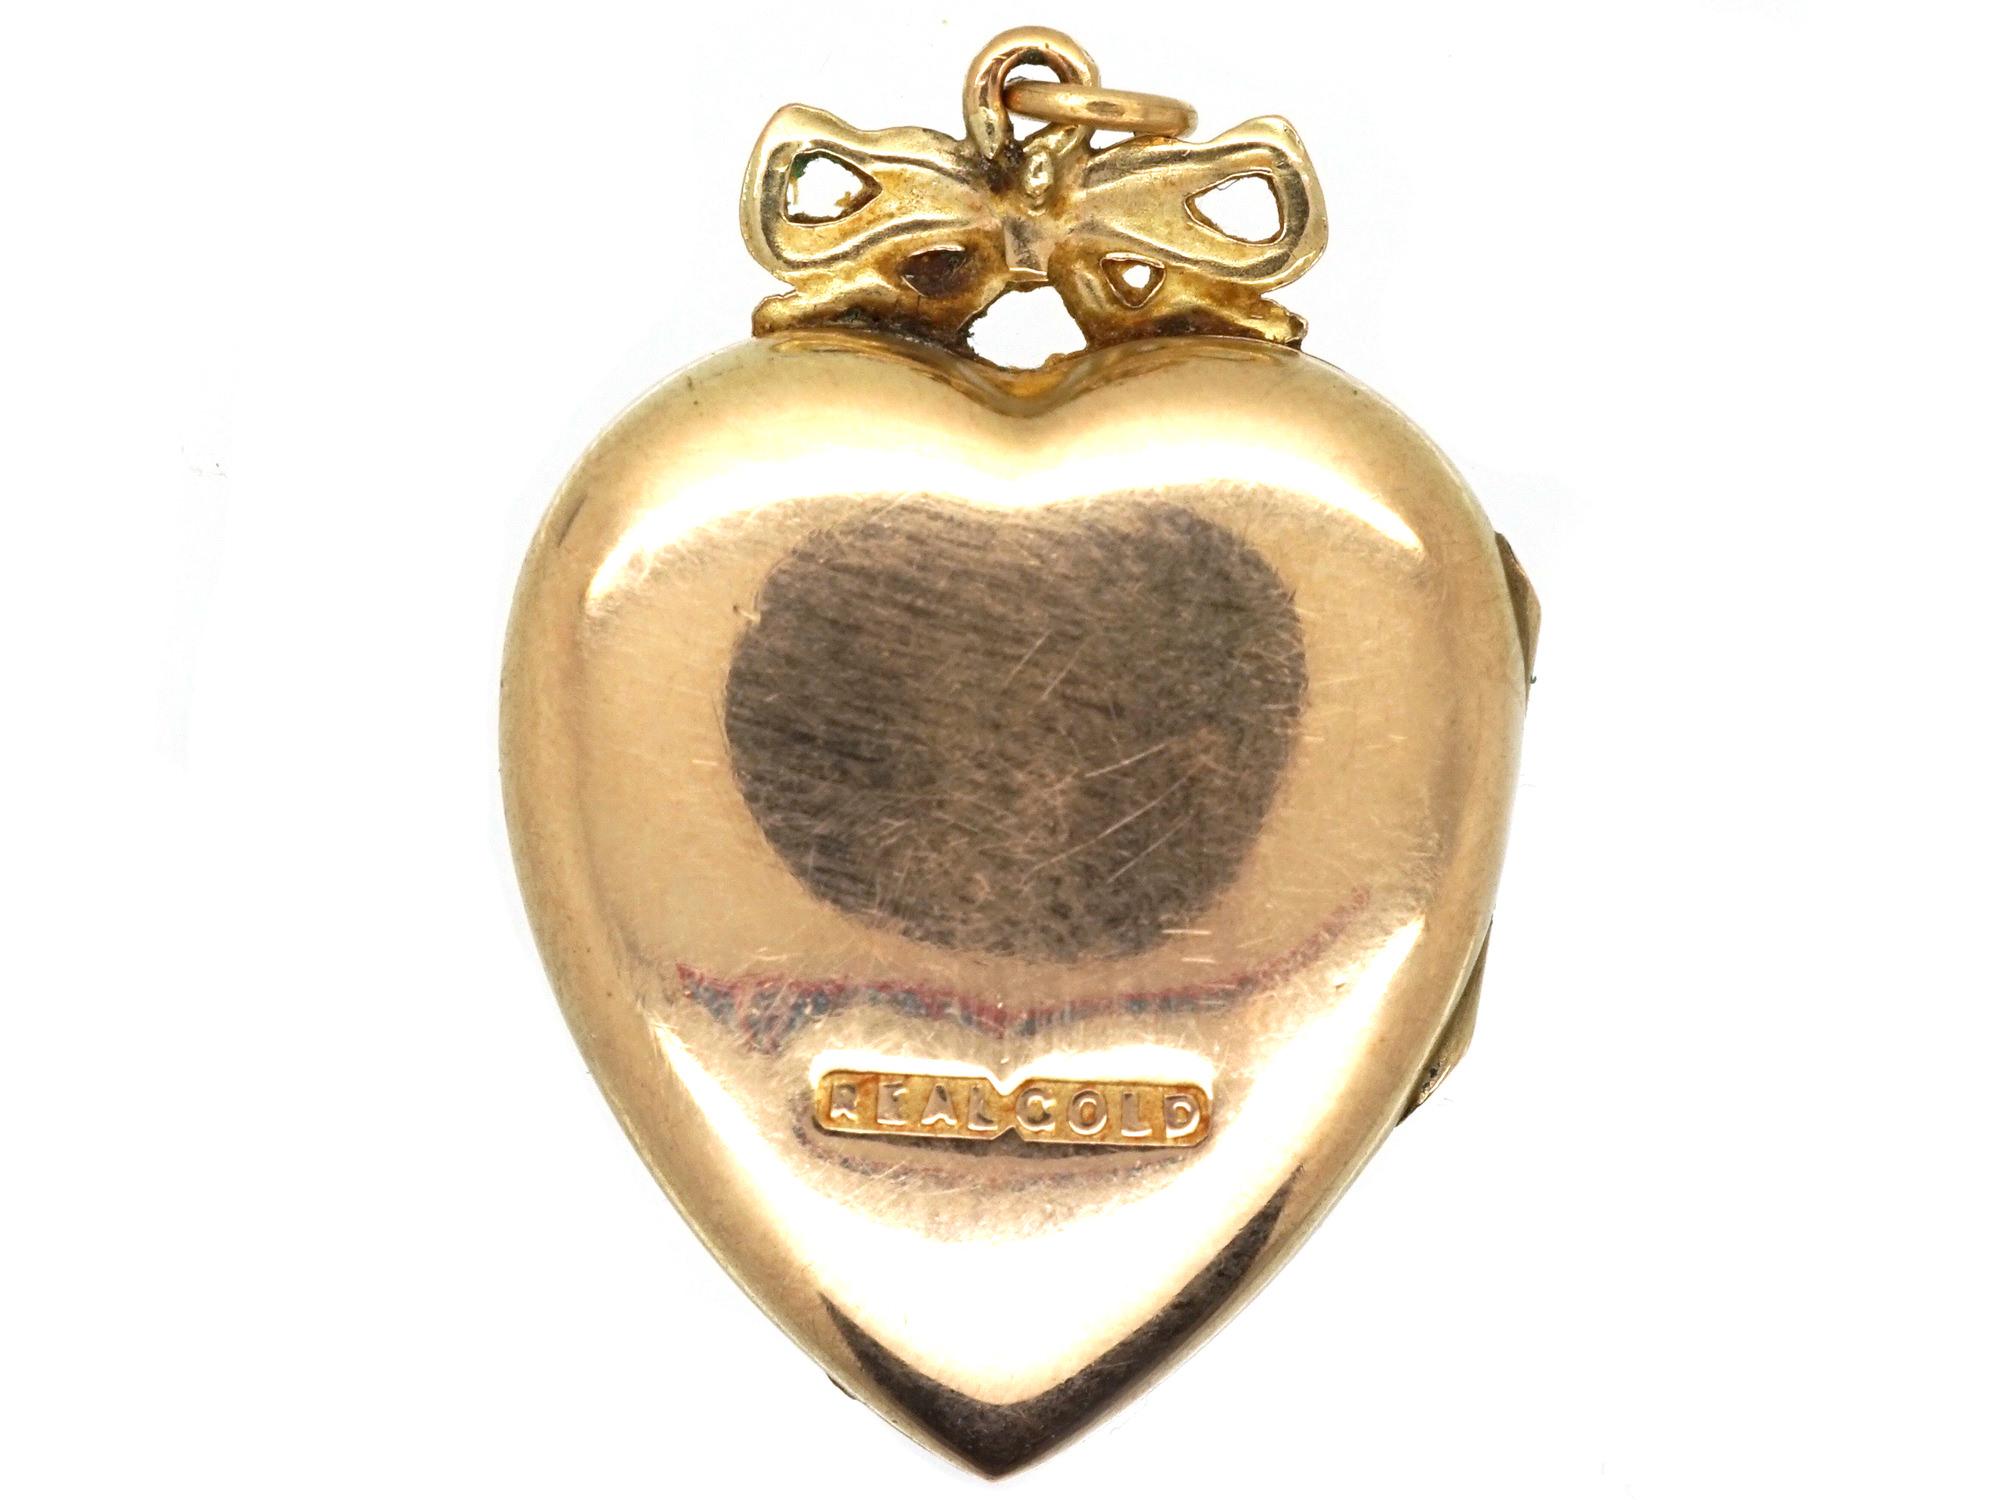 Edwardian 9ct Gold Heart Locket Set With a Rose Diamond